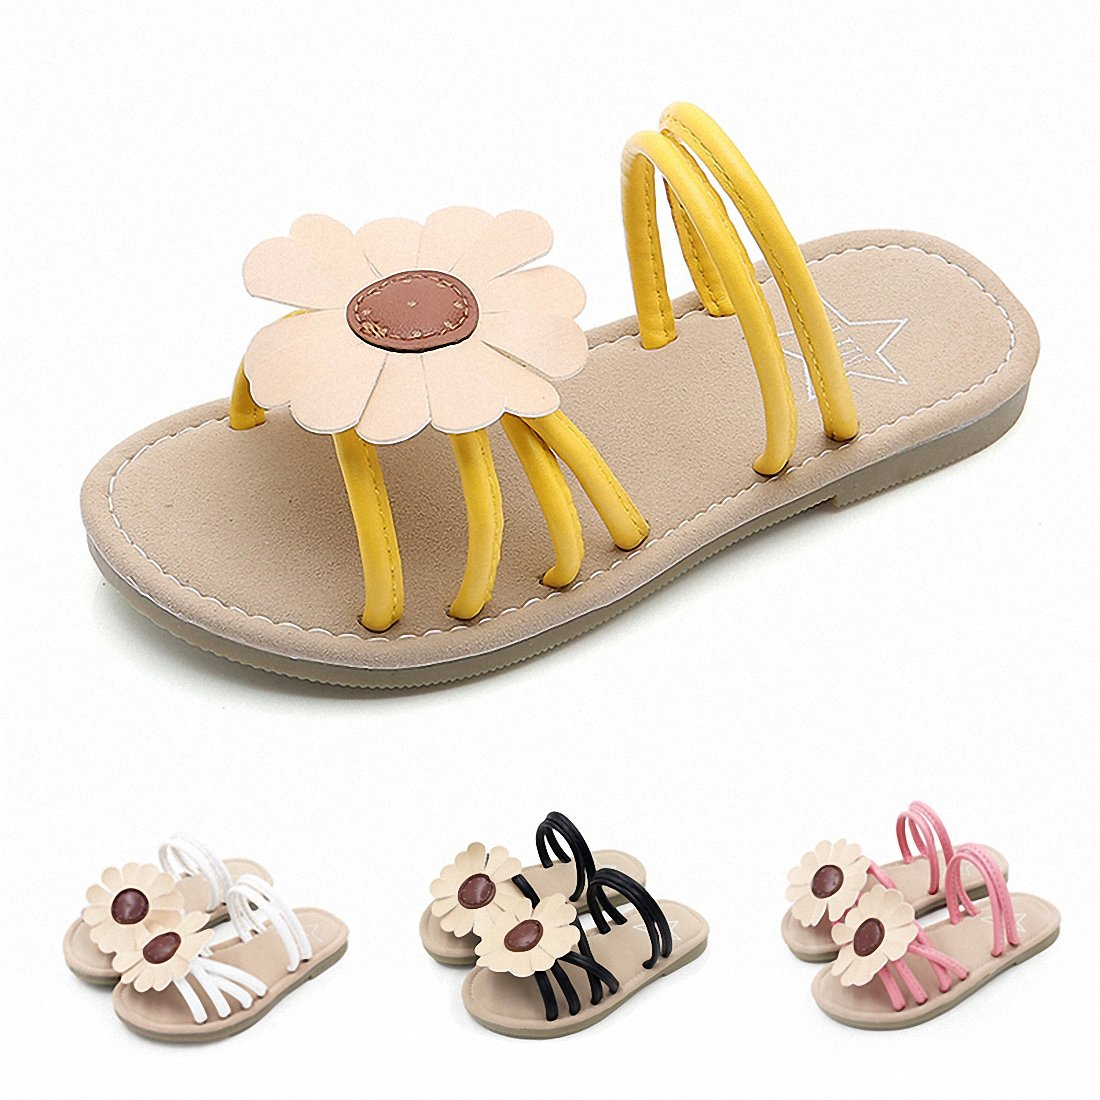 Girl's Flower Flat Sandal Slippers Cute Summer Open Toe Princess Dress Sandals for Kids(Toddler/Little Kid/Big Kid) Y-32